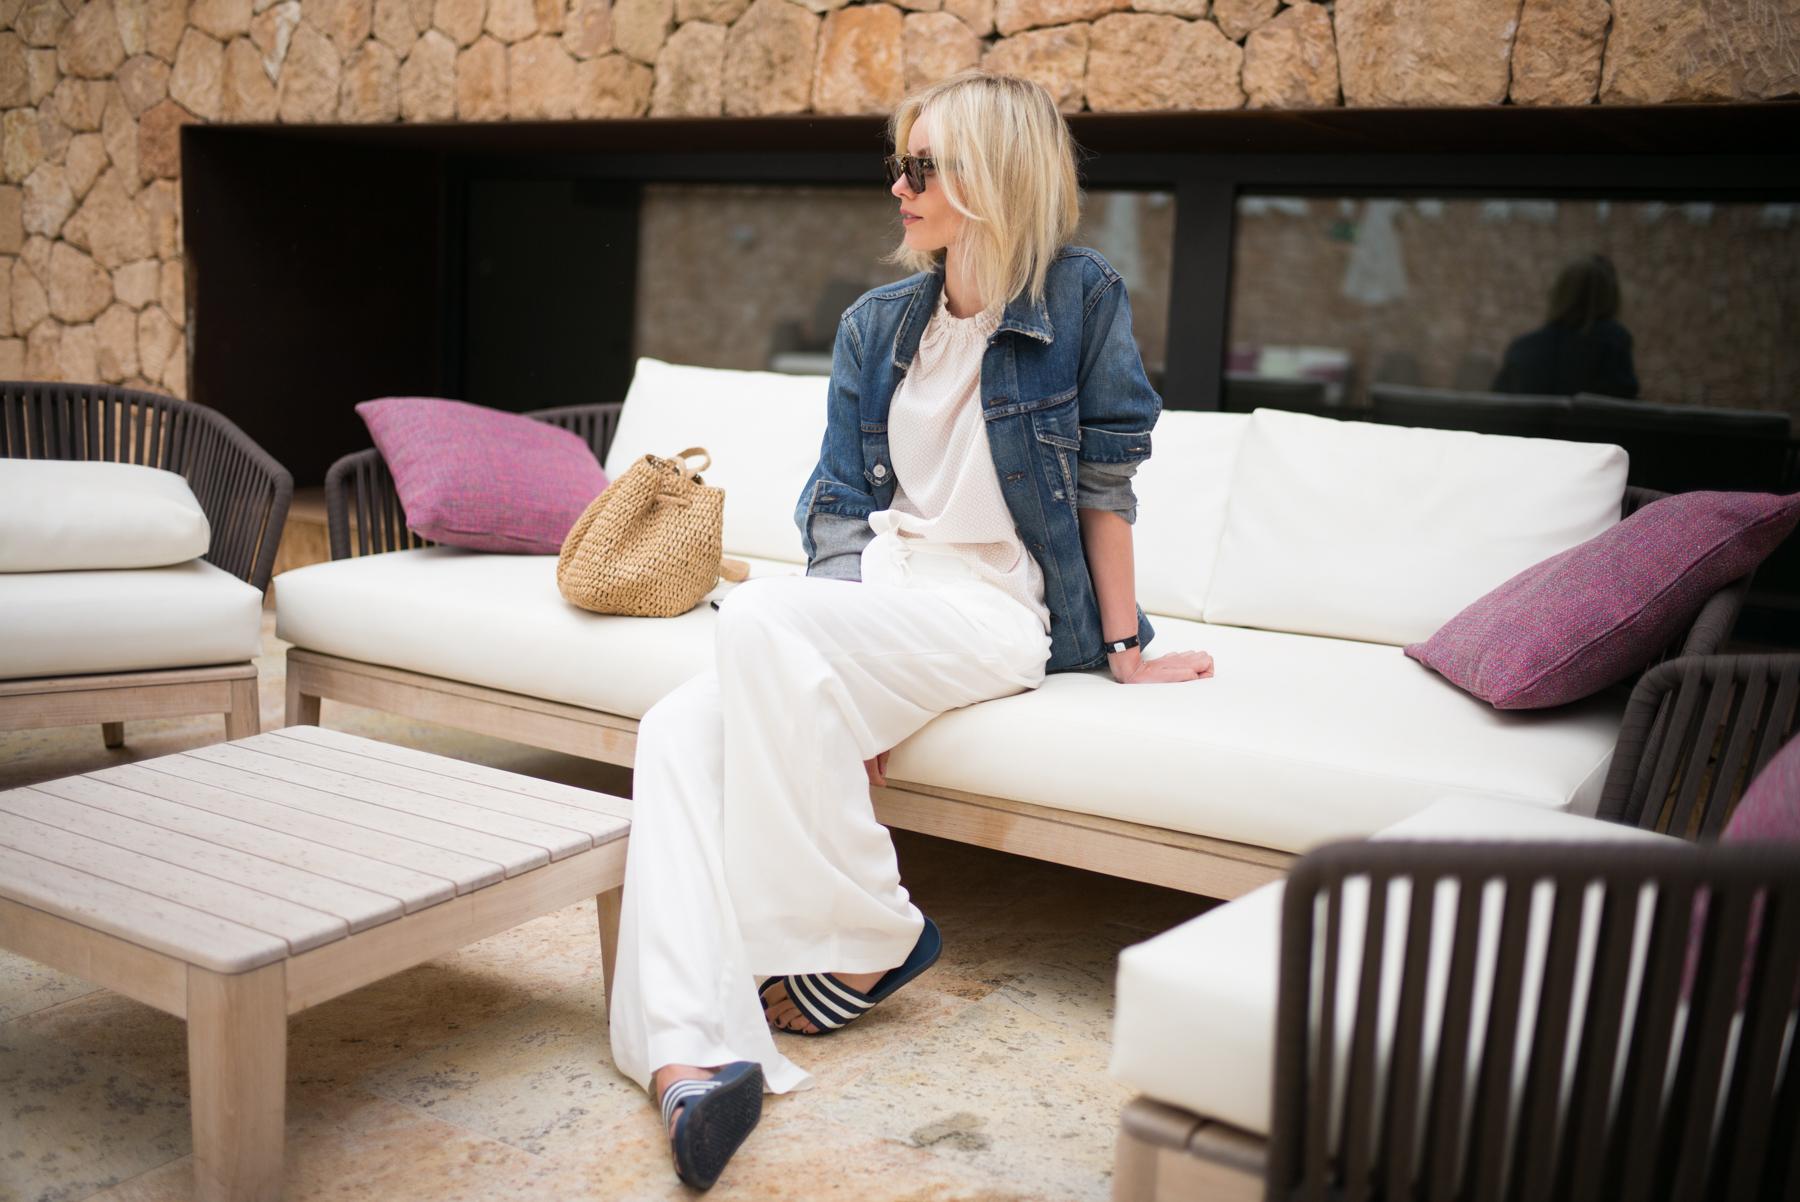 lisa-rvd-comma-white_pants_3